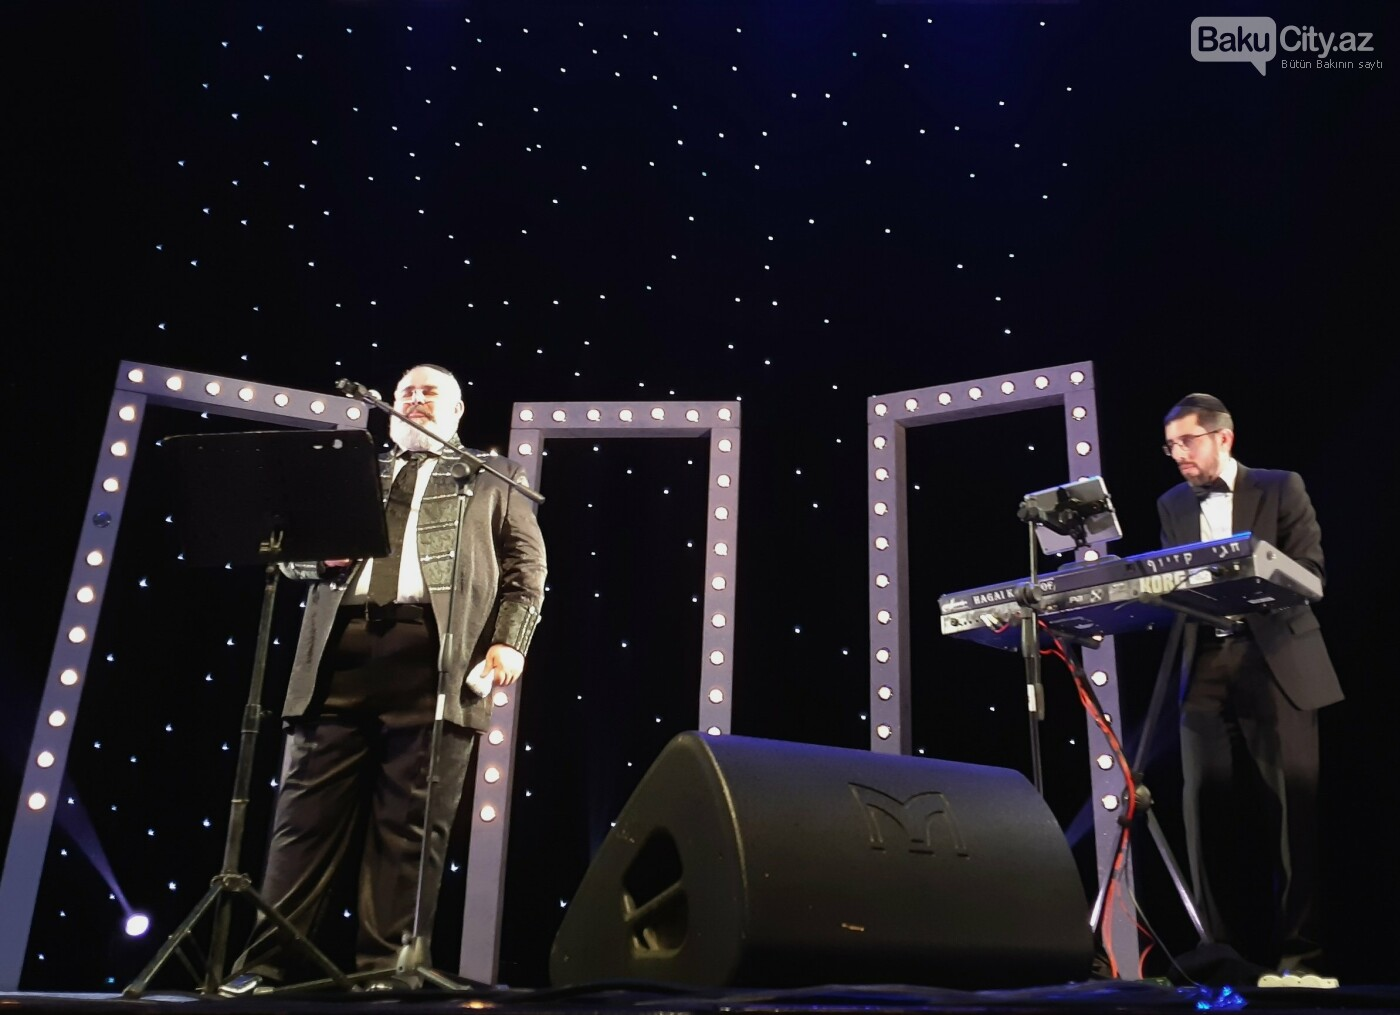 Bakıda tanınmış flamenko ifaçısısı konsert verdi – FOTO/VİDEO, fotoşəkil-8